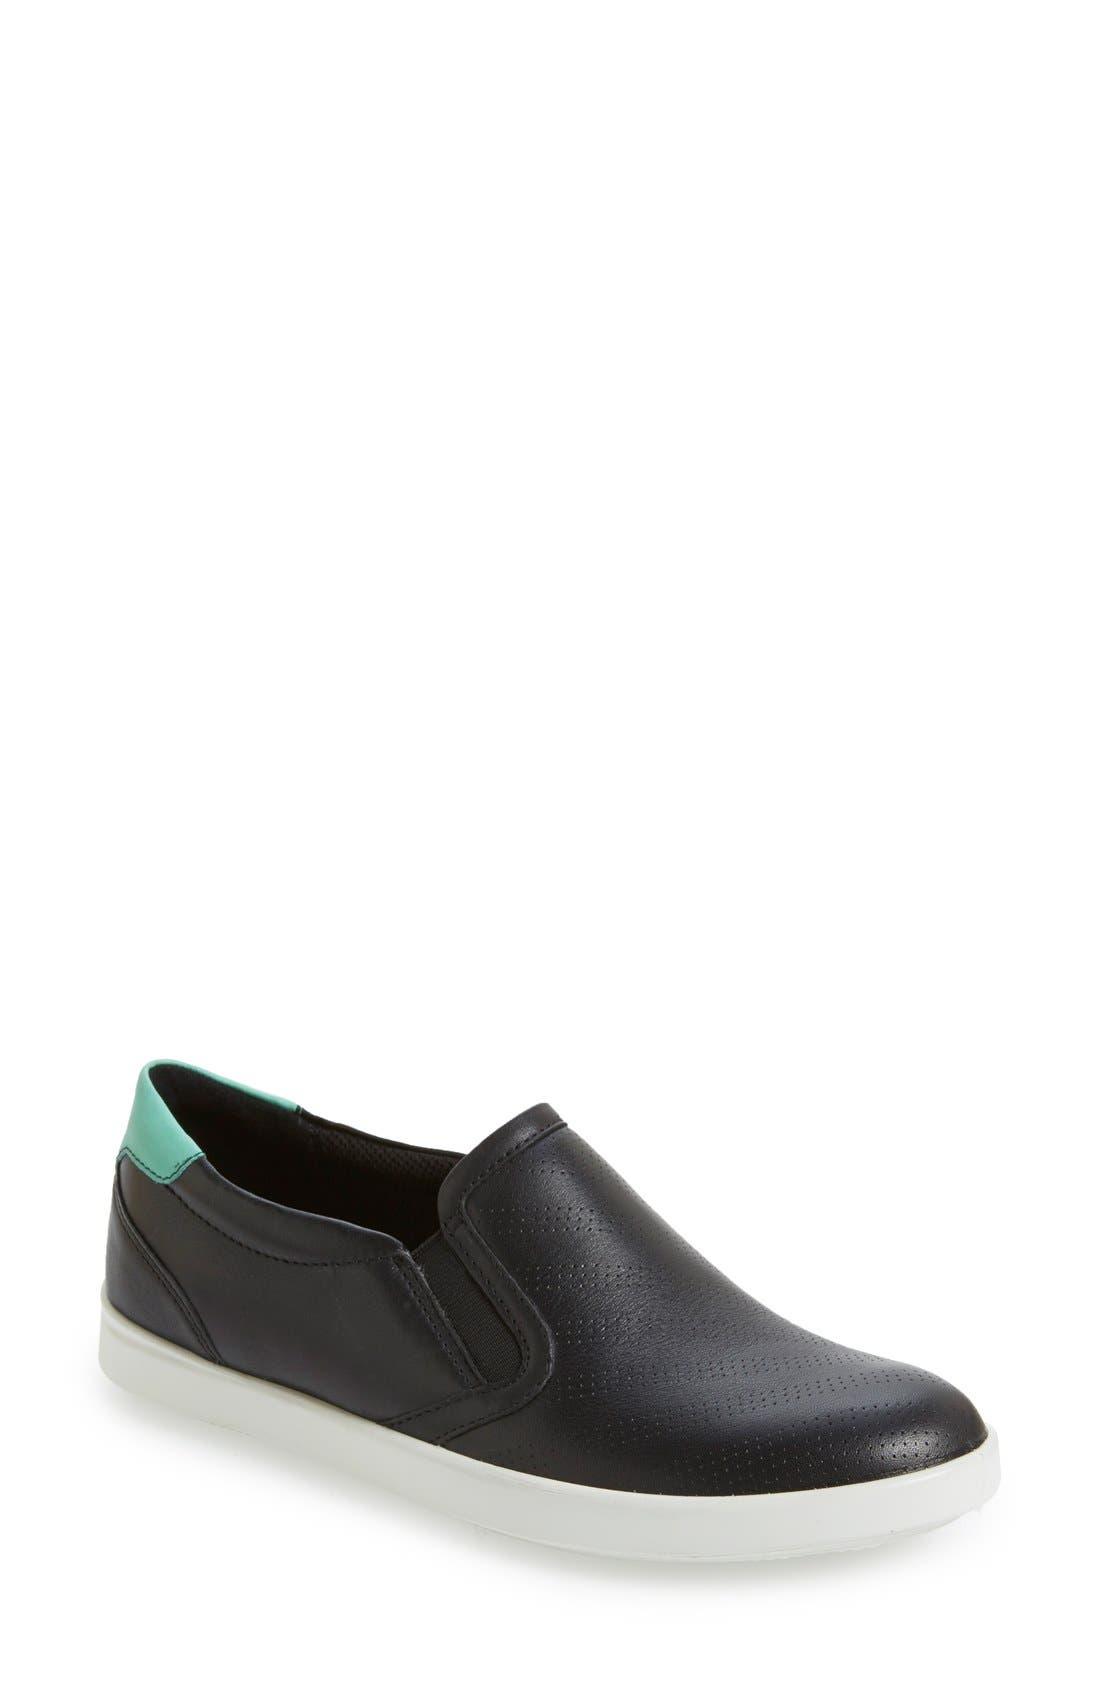 'Aimee' Slip-On Sneaker,                             Main thumbnail 1, color,                             Black/ Granite Green Leather